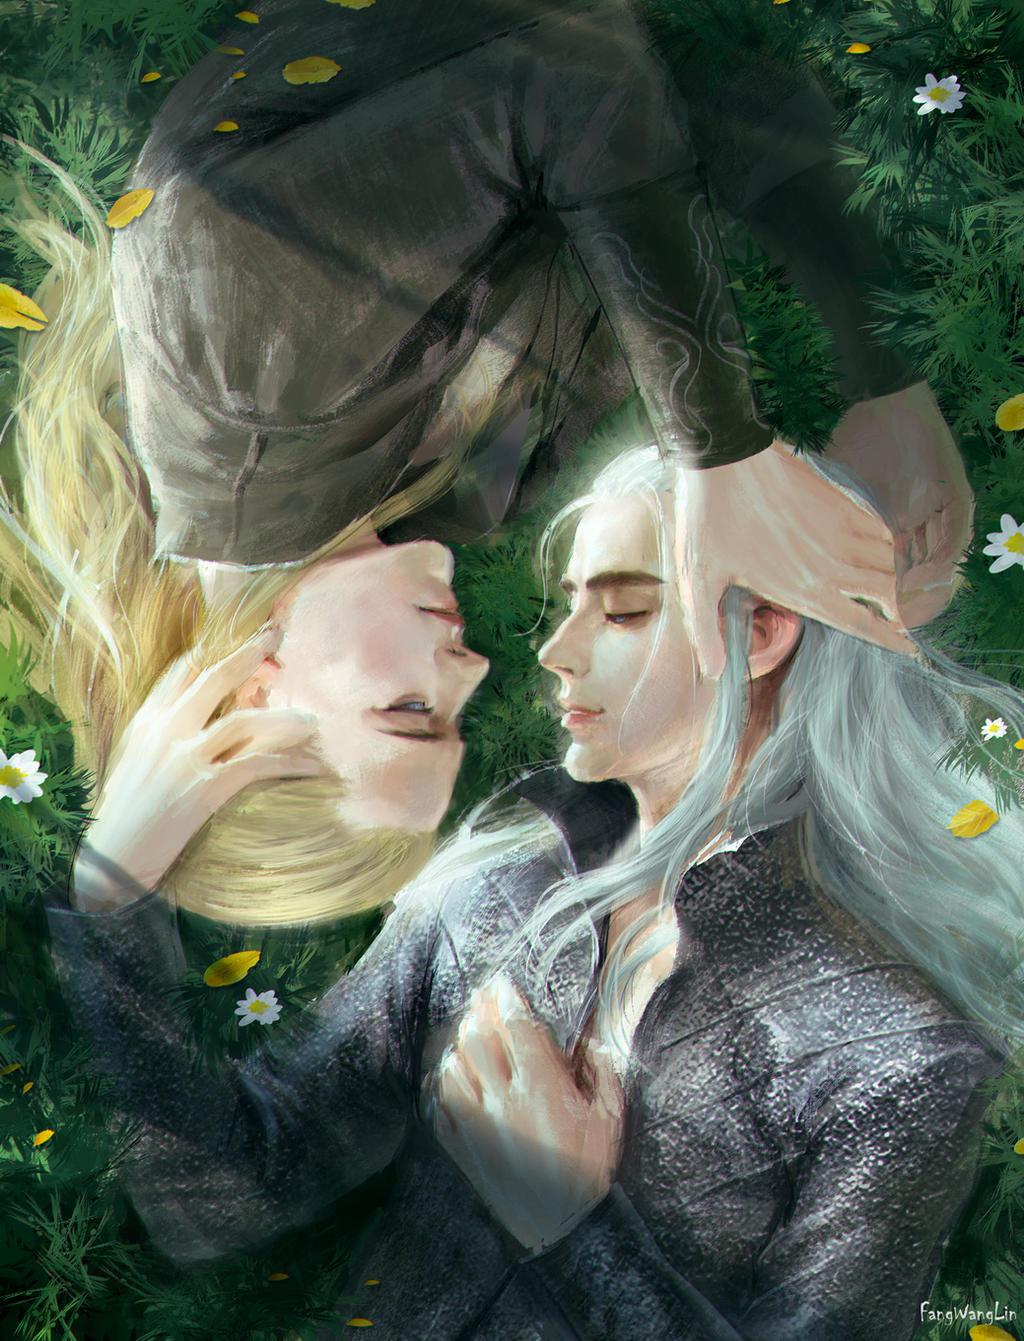 Thranduil and Legolas by FangWangLlin on DeviantArt